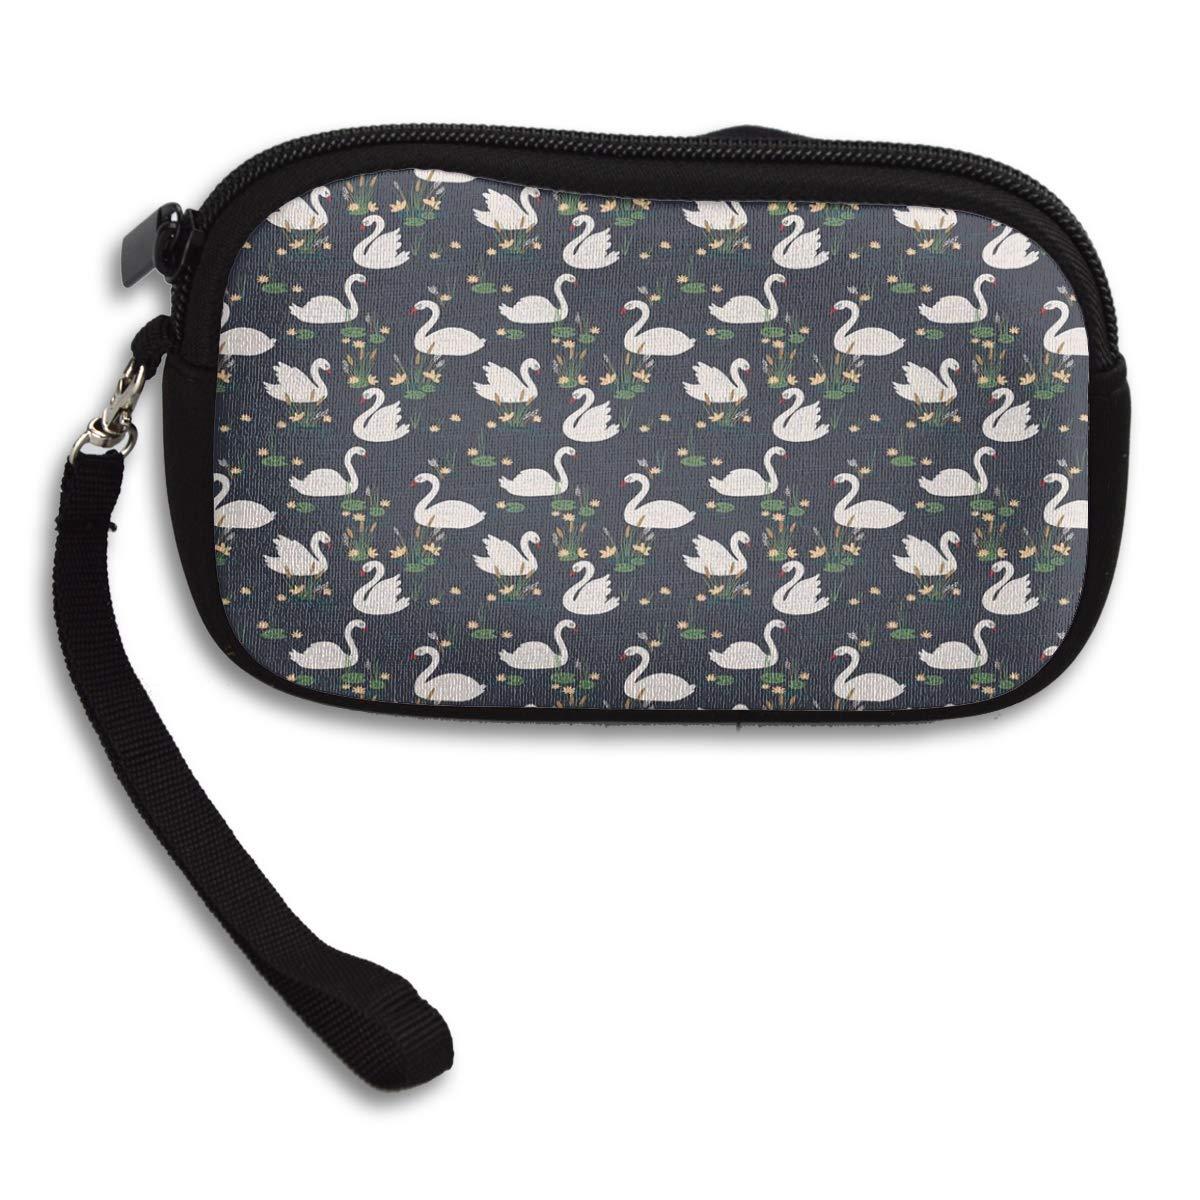 Swan Pond Lilies Cattails Blue Lake Coin Pouch Clutch Purse Wristlet Wallet Phone Card Holder Handbag